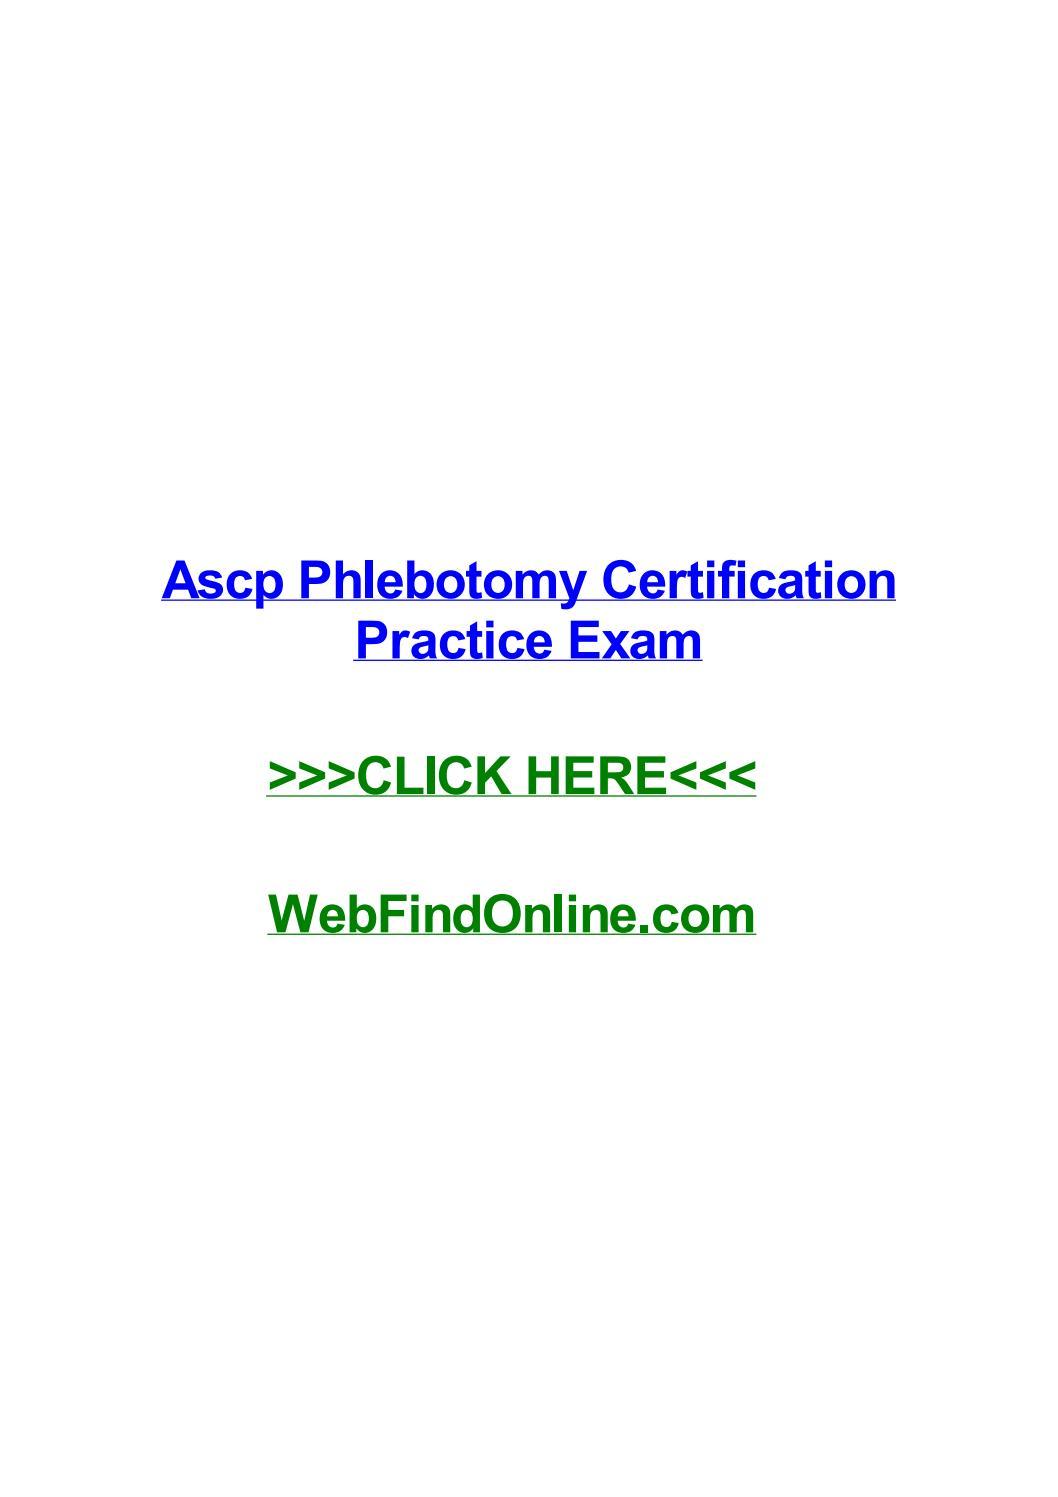 Ascp Phlebotomy Certification Practice Exam By Dorisxdfv Issuu